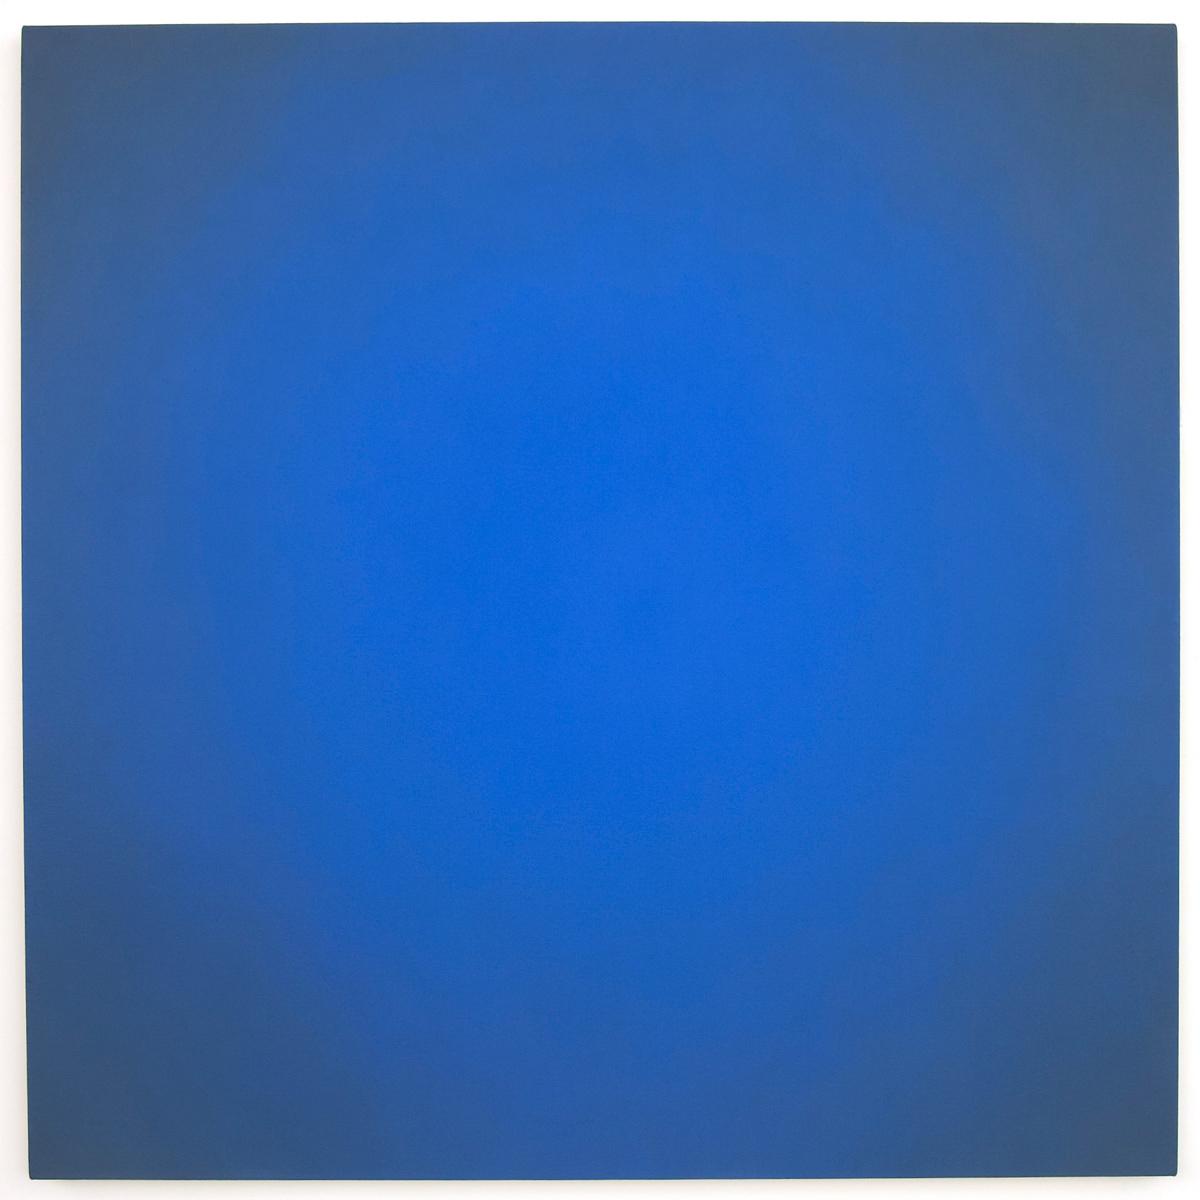 Blue Orange #1 (Orange), Equivalence Blue Orange Series, 2005, oil on canvas, 48 x 48 in. (122 x 122 cm.)